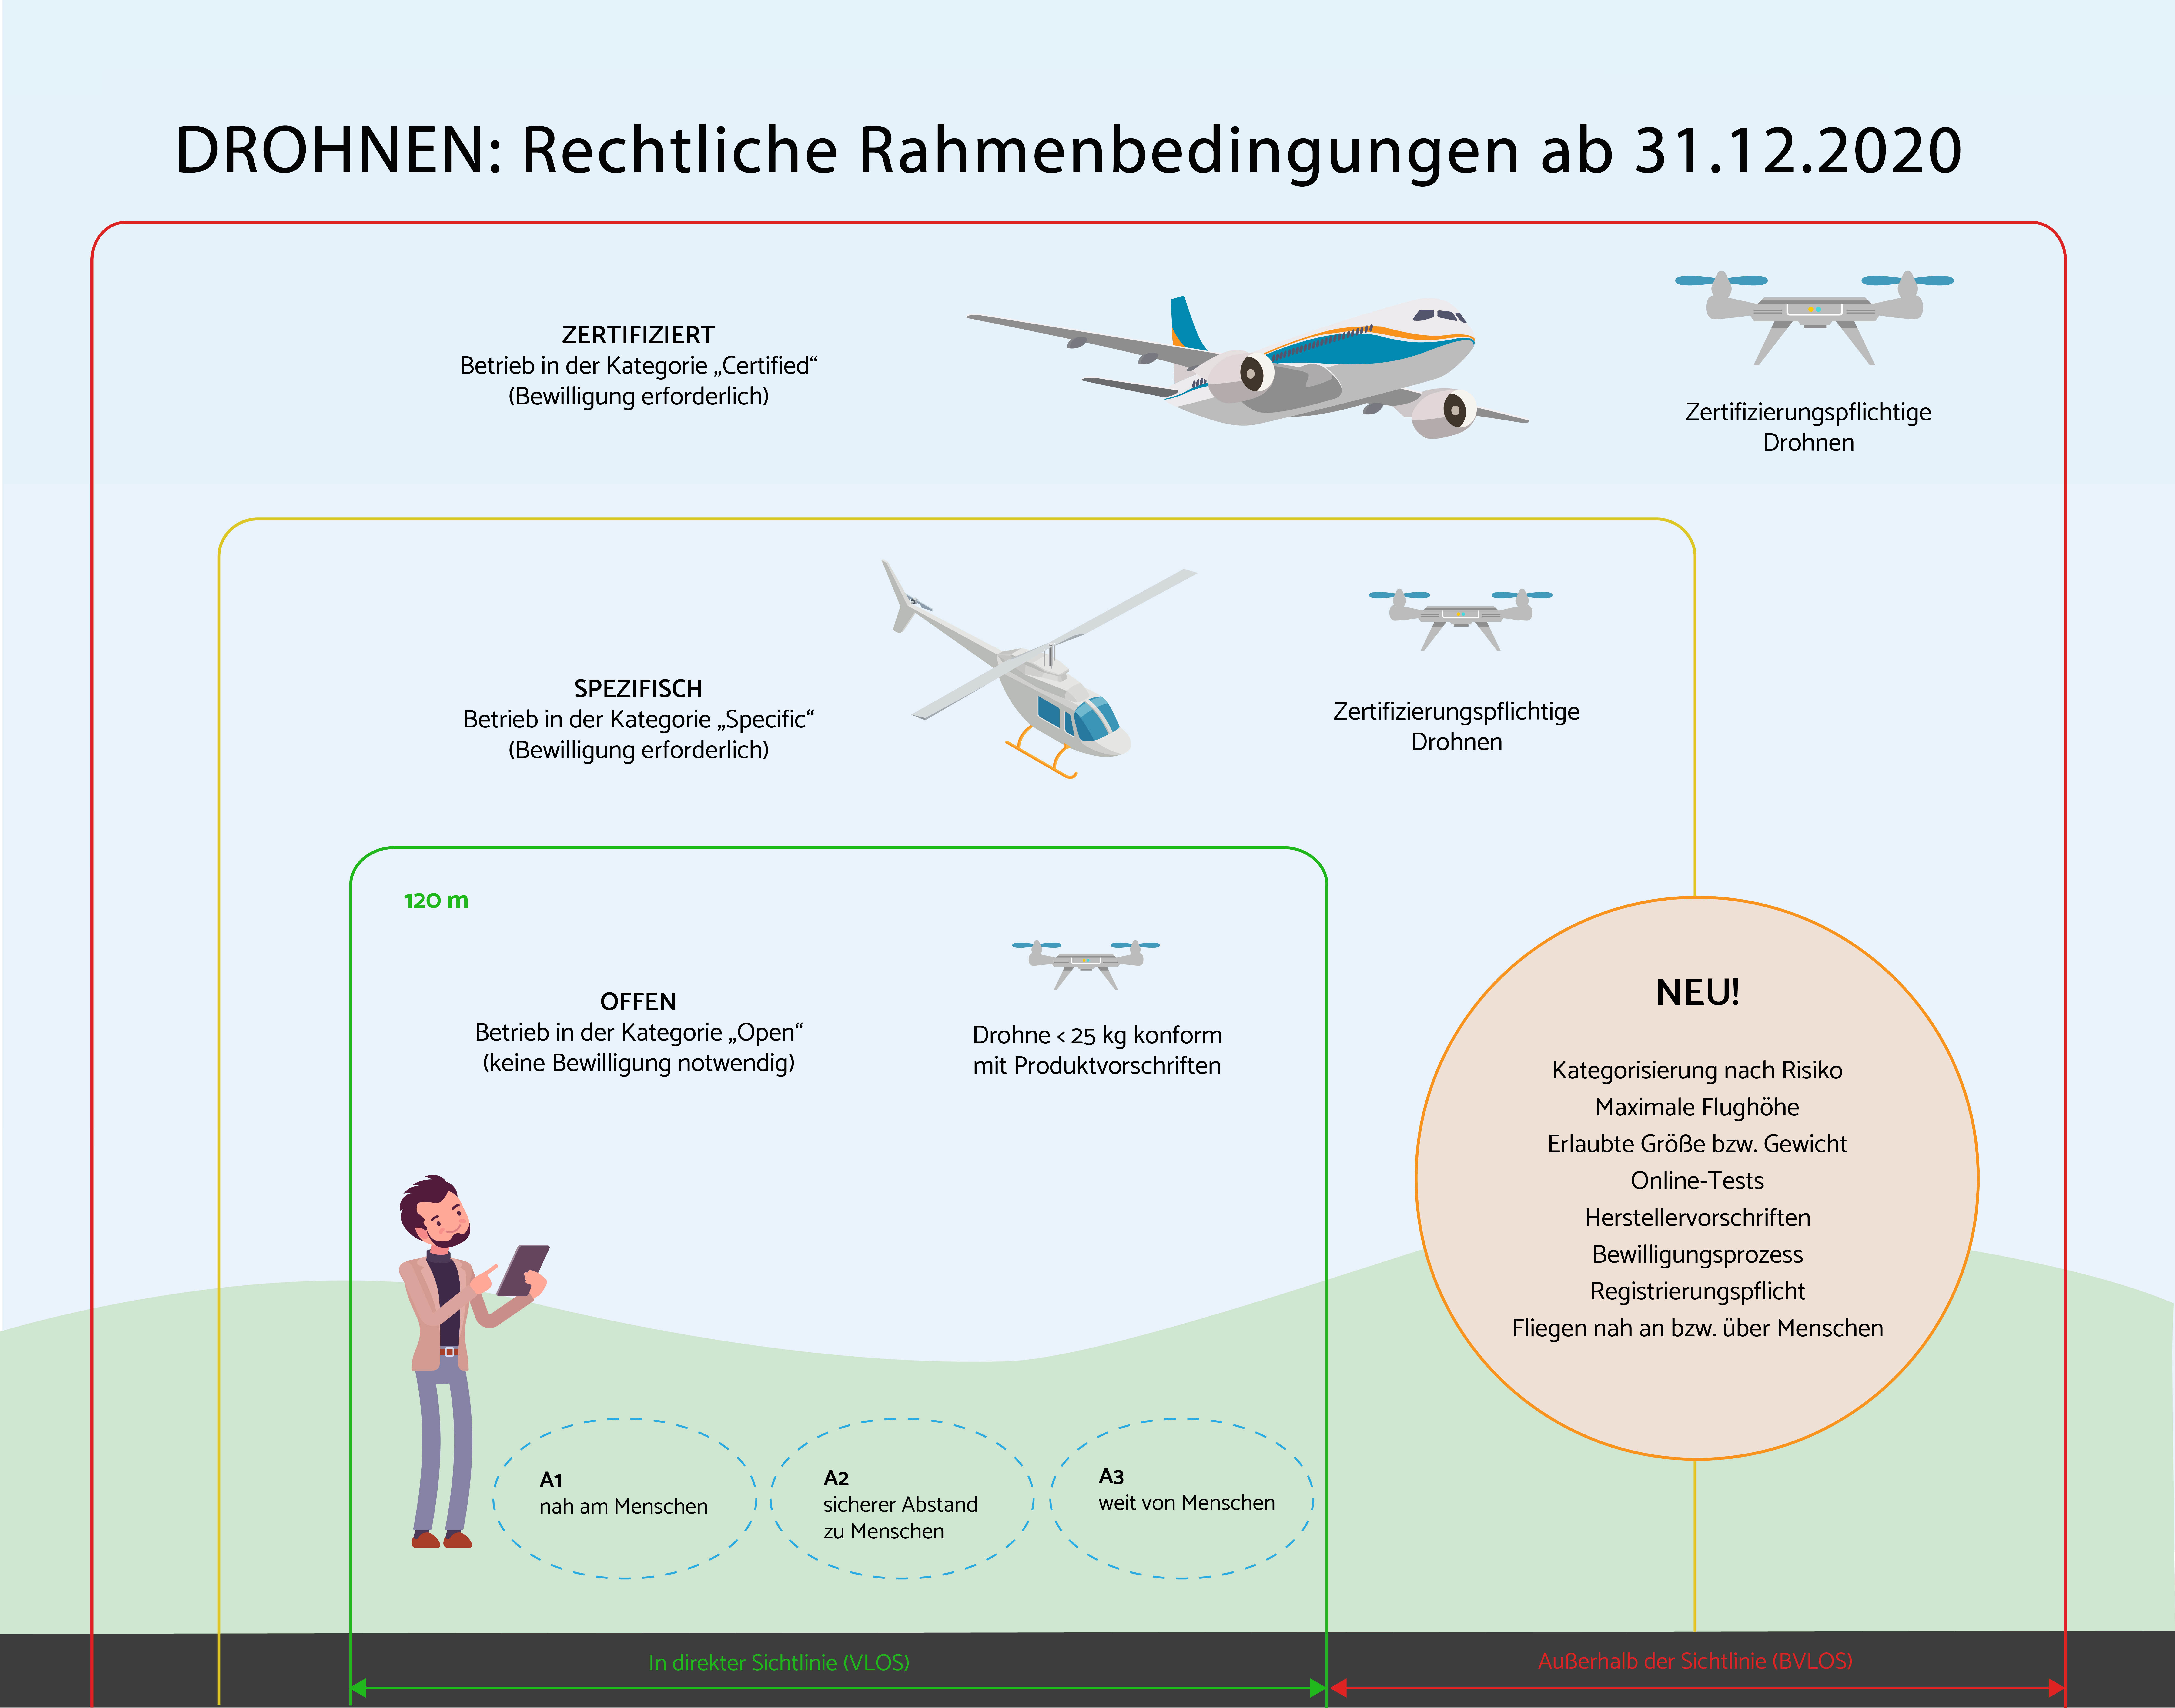 dronespace.at, offen , spezifisch, zertifiziert